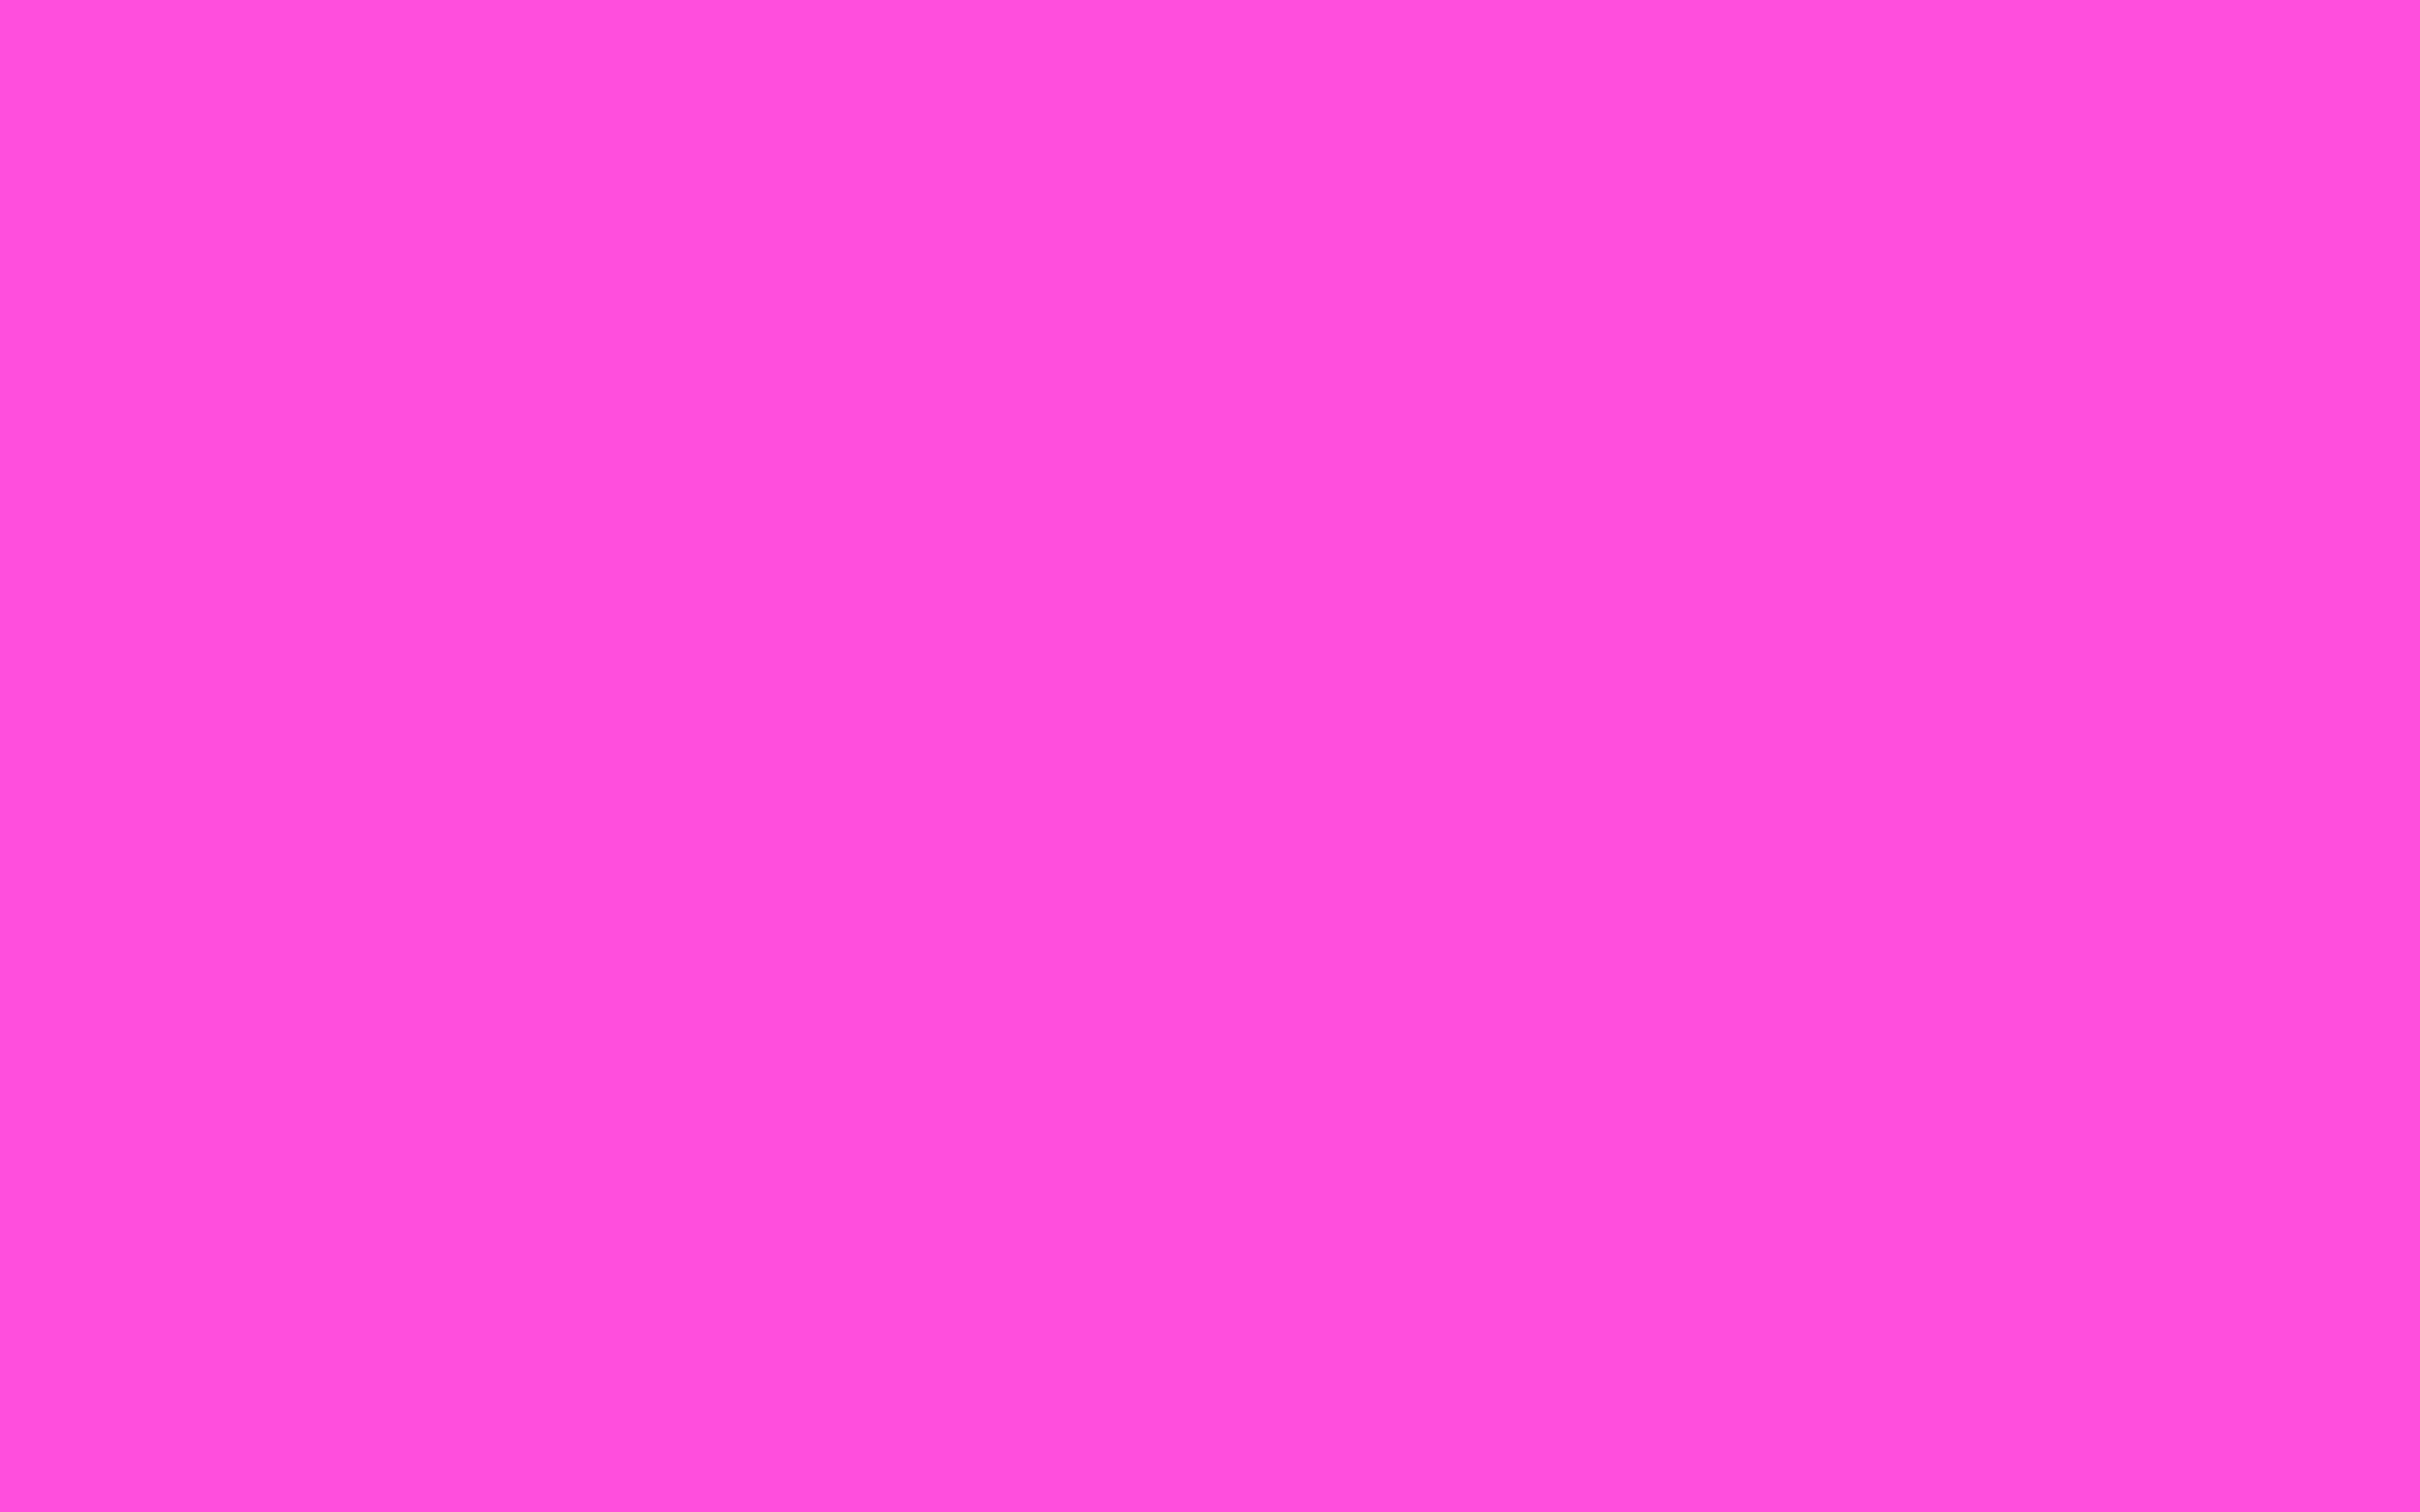 2560x1600 Purple Pizzazz Solid Color Background